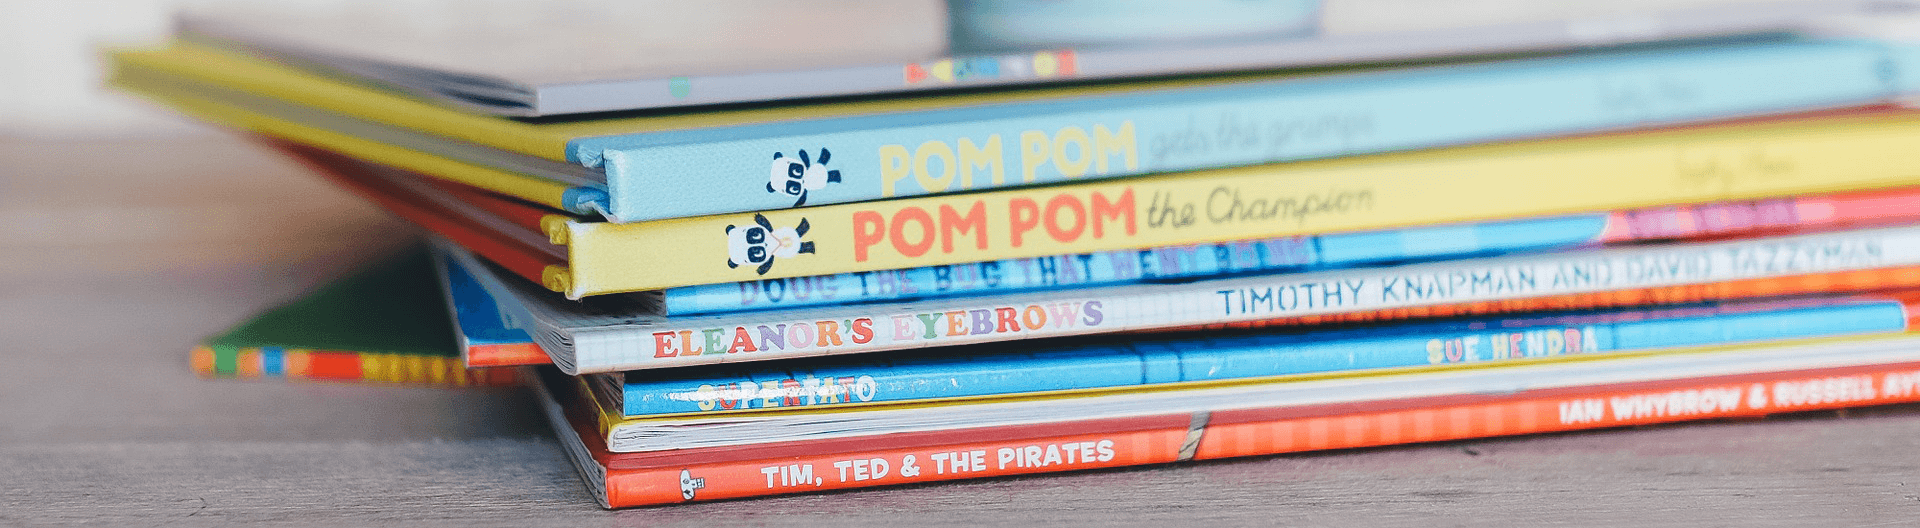 Recommended Books For Children